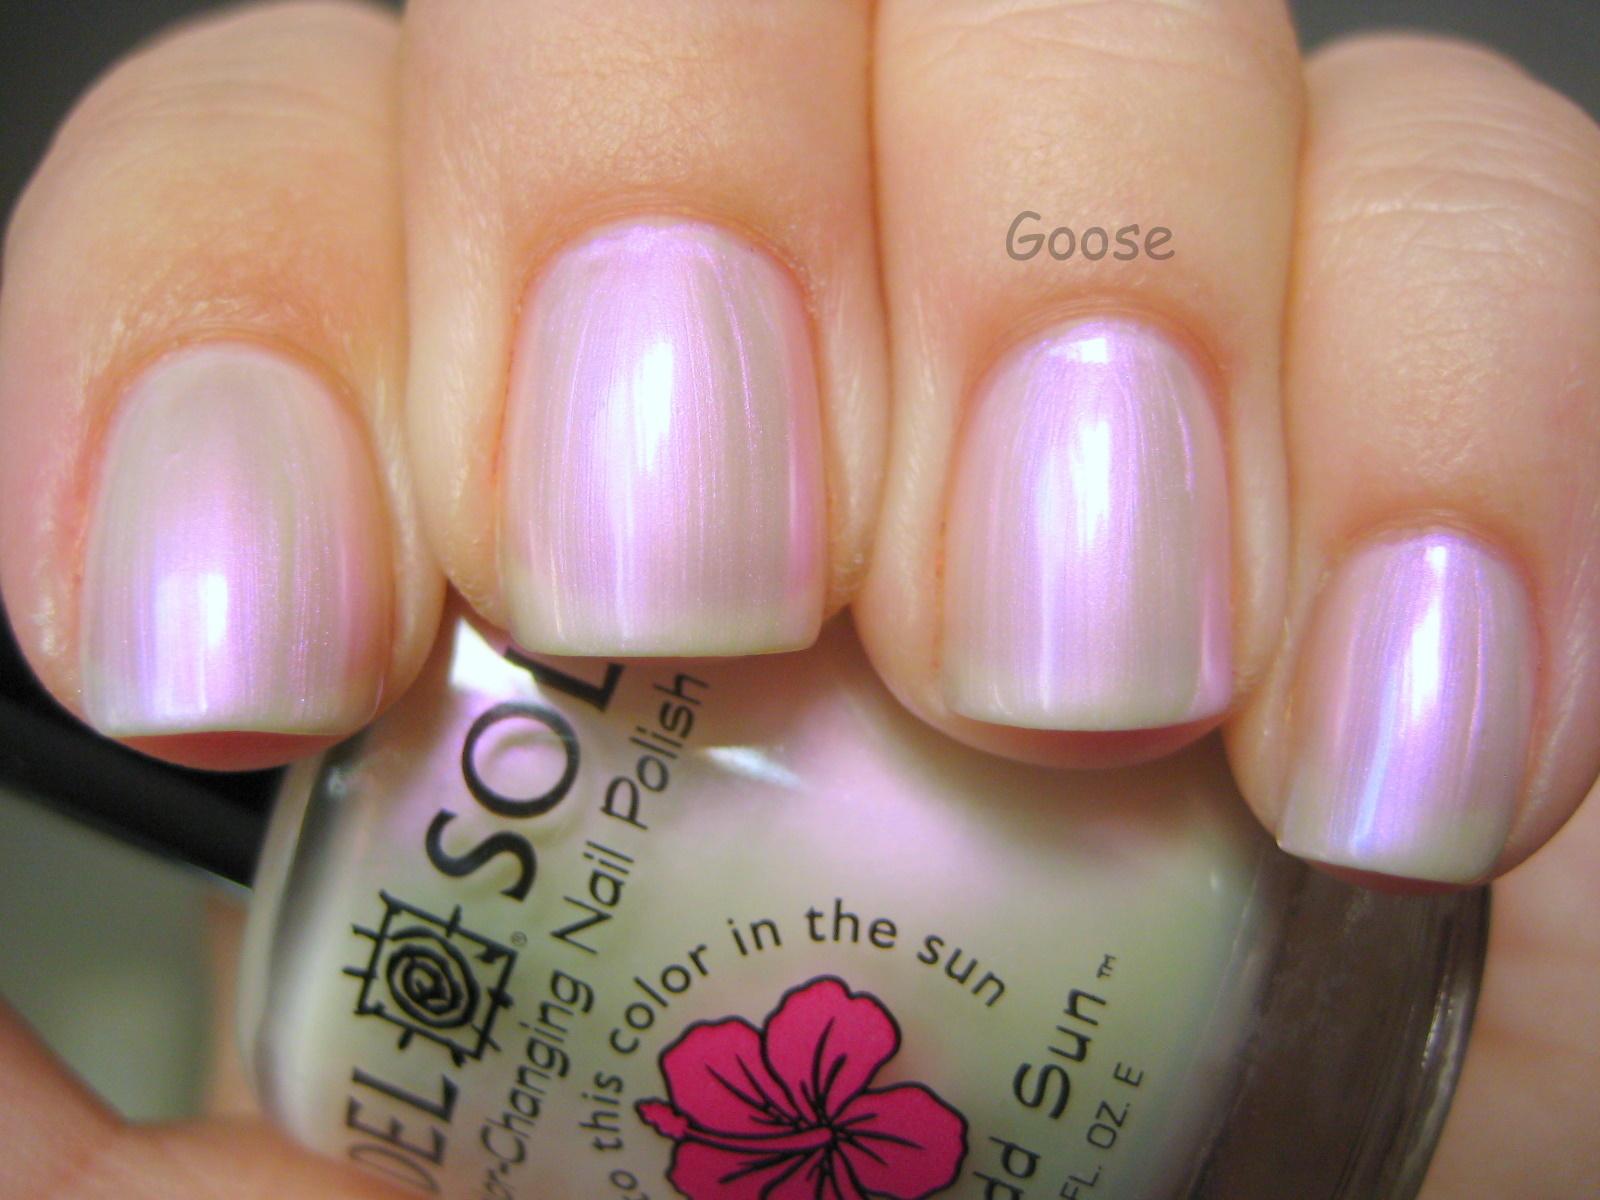 Goose\'s Glitter: Some fun Valentine\'s Day colors from Del Sol